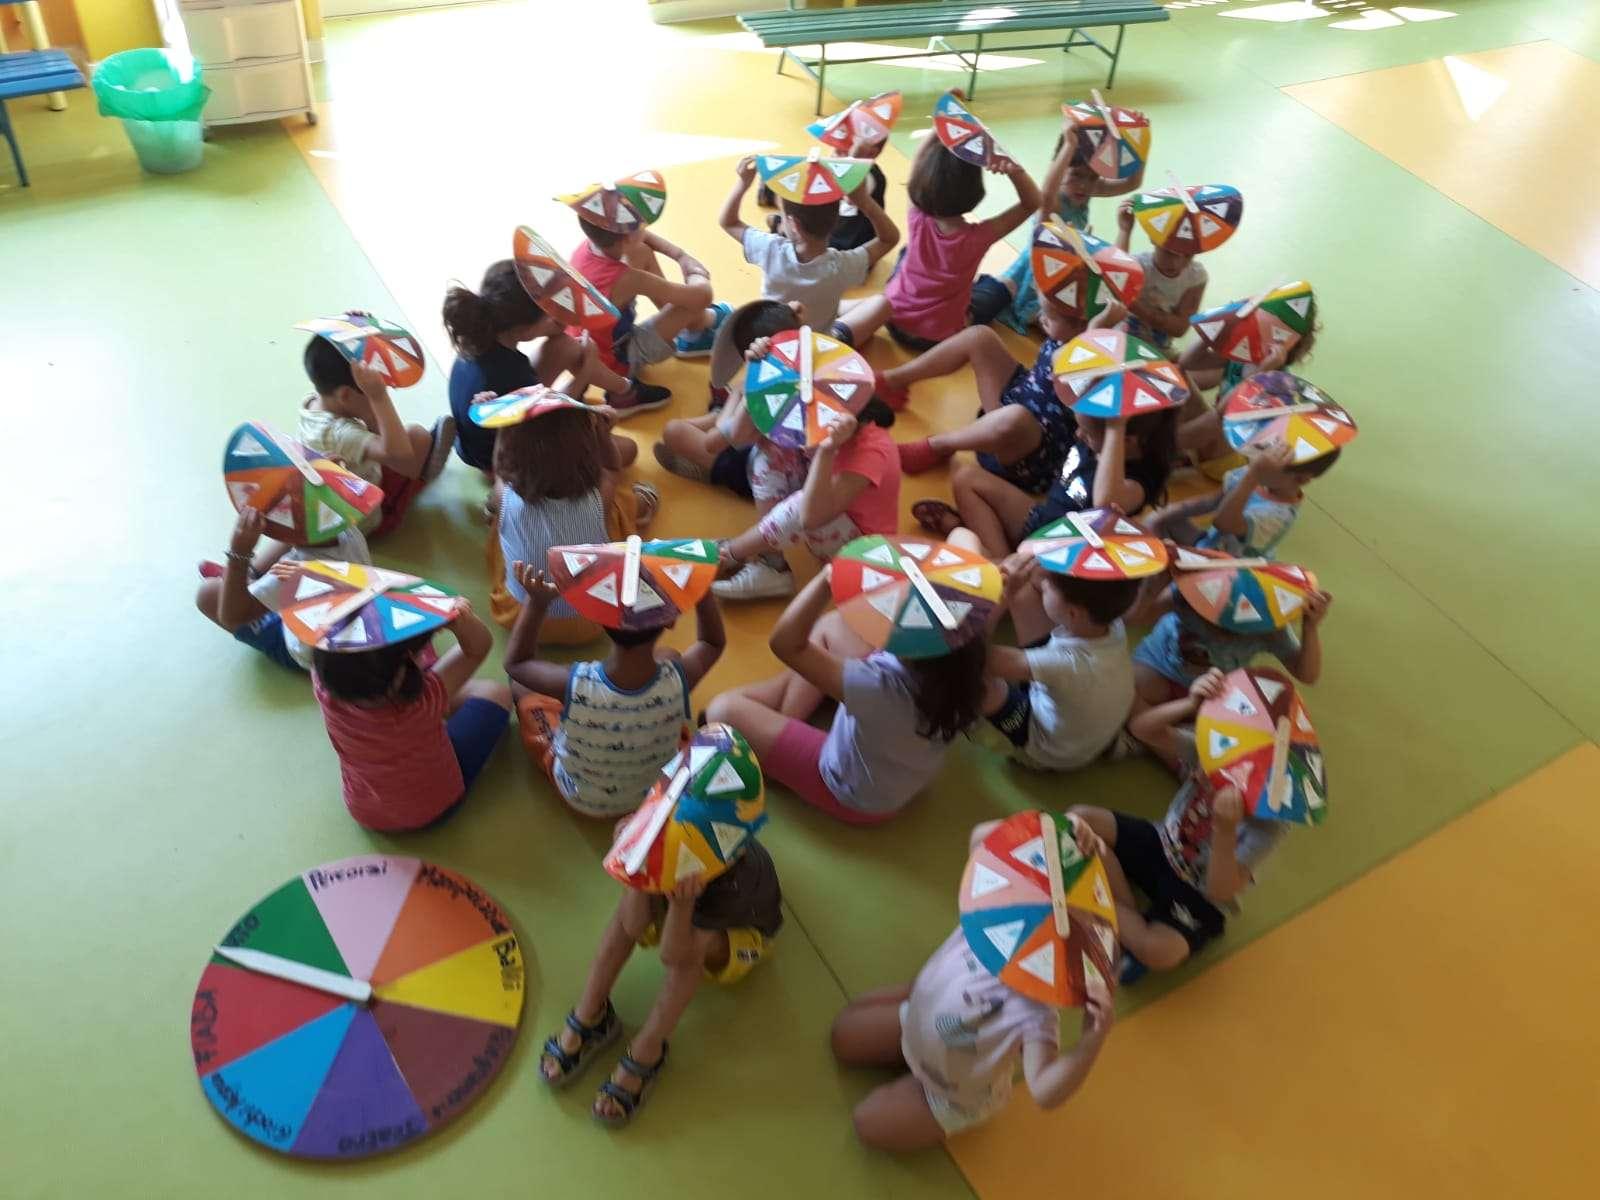 IMG 20190803 WA0030 - Scuola Materna Peschiera Borromeo